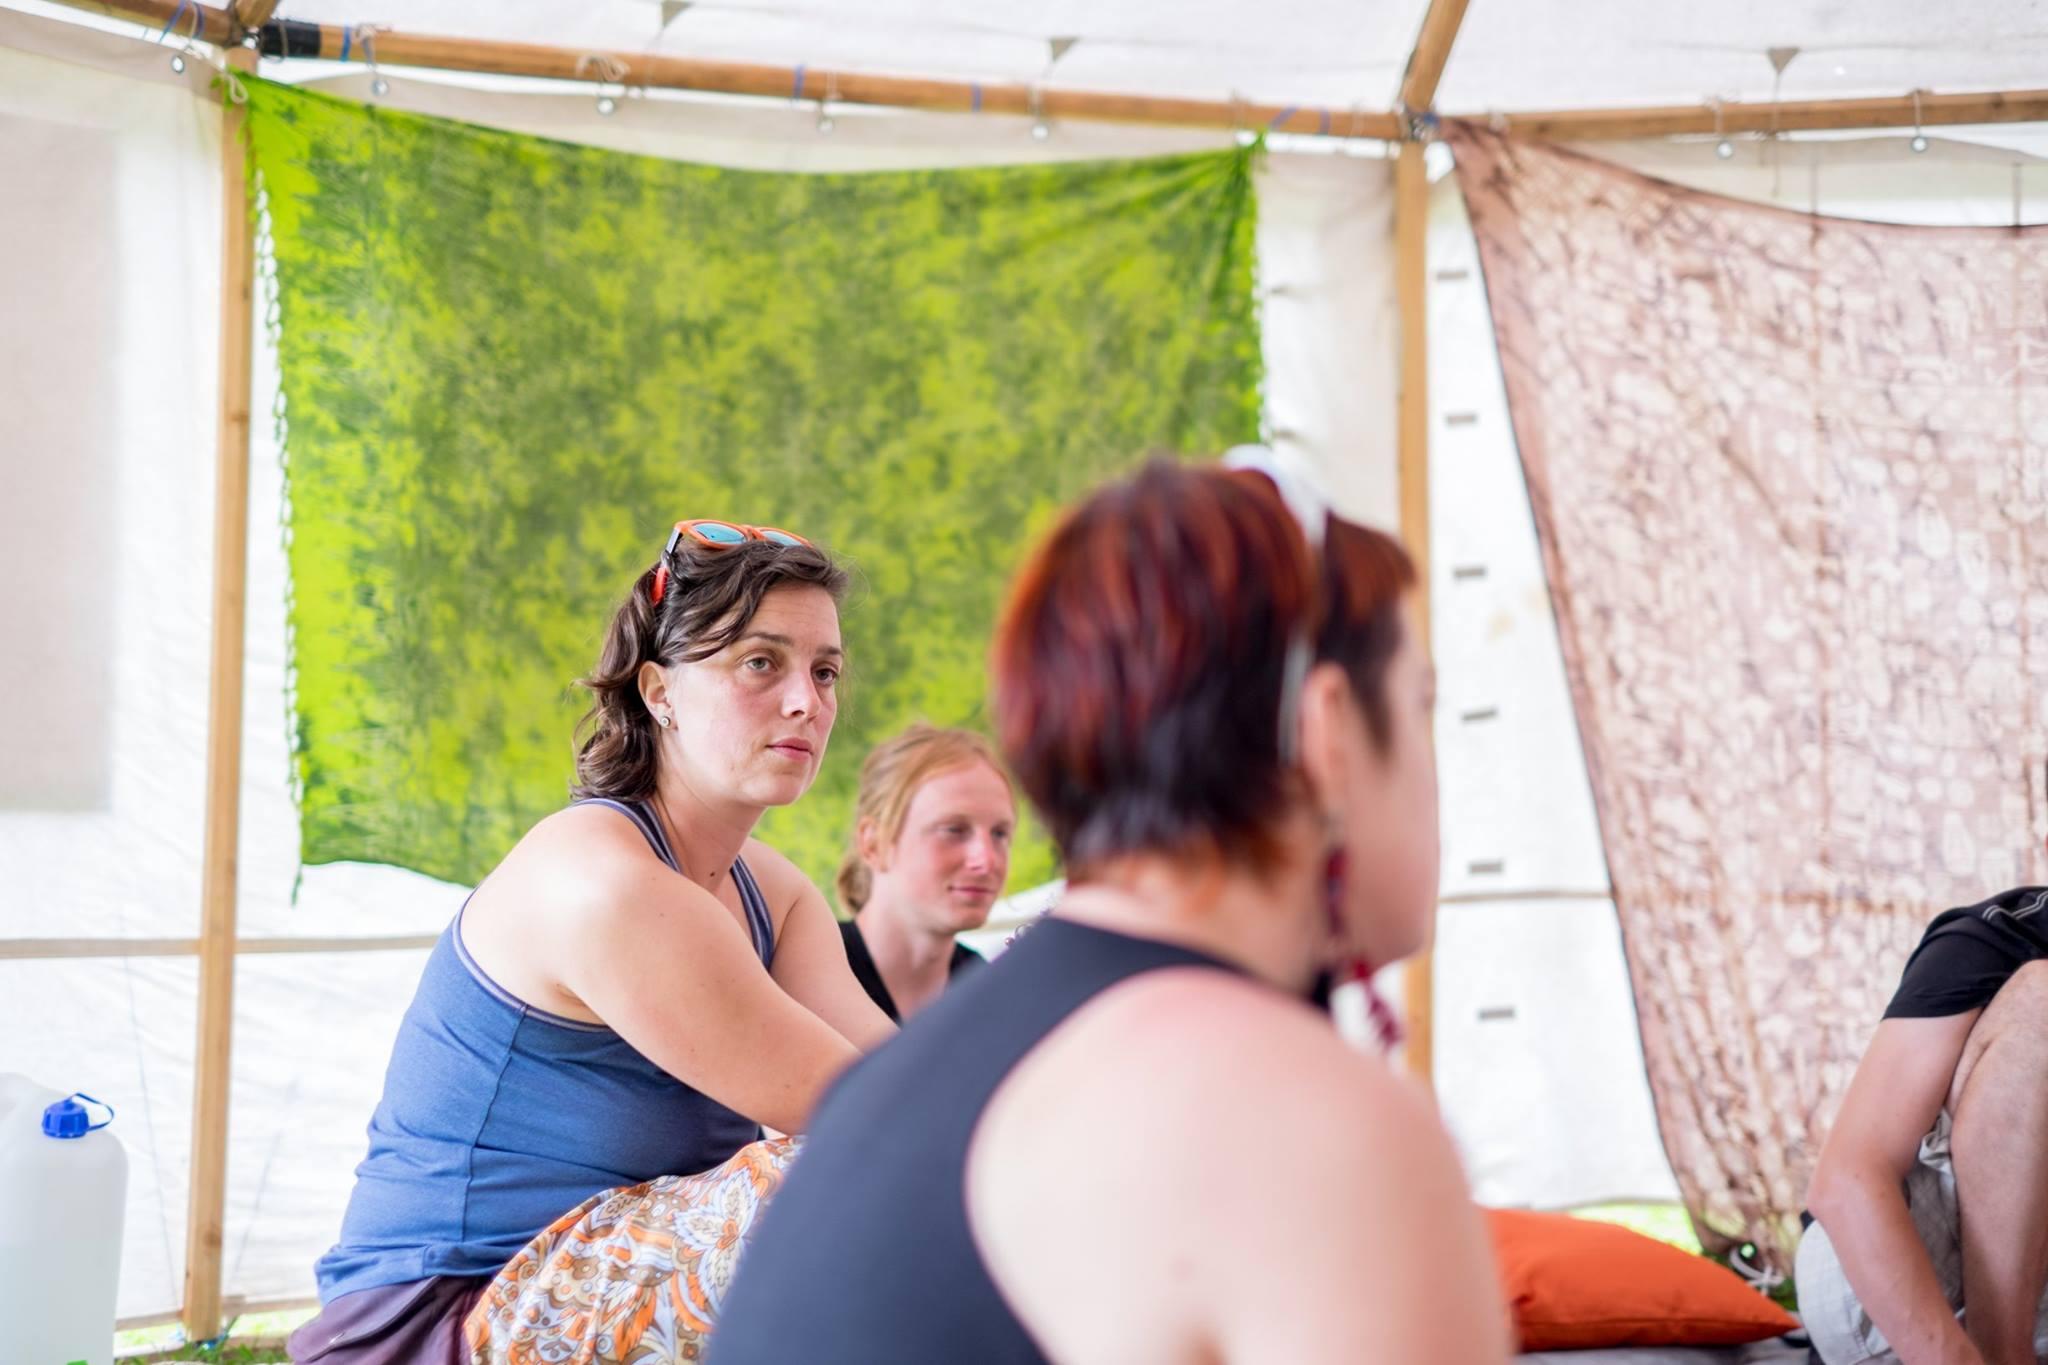 Svatava Bardynova at PsyCare, UFO BUFO festival